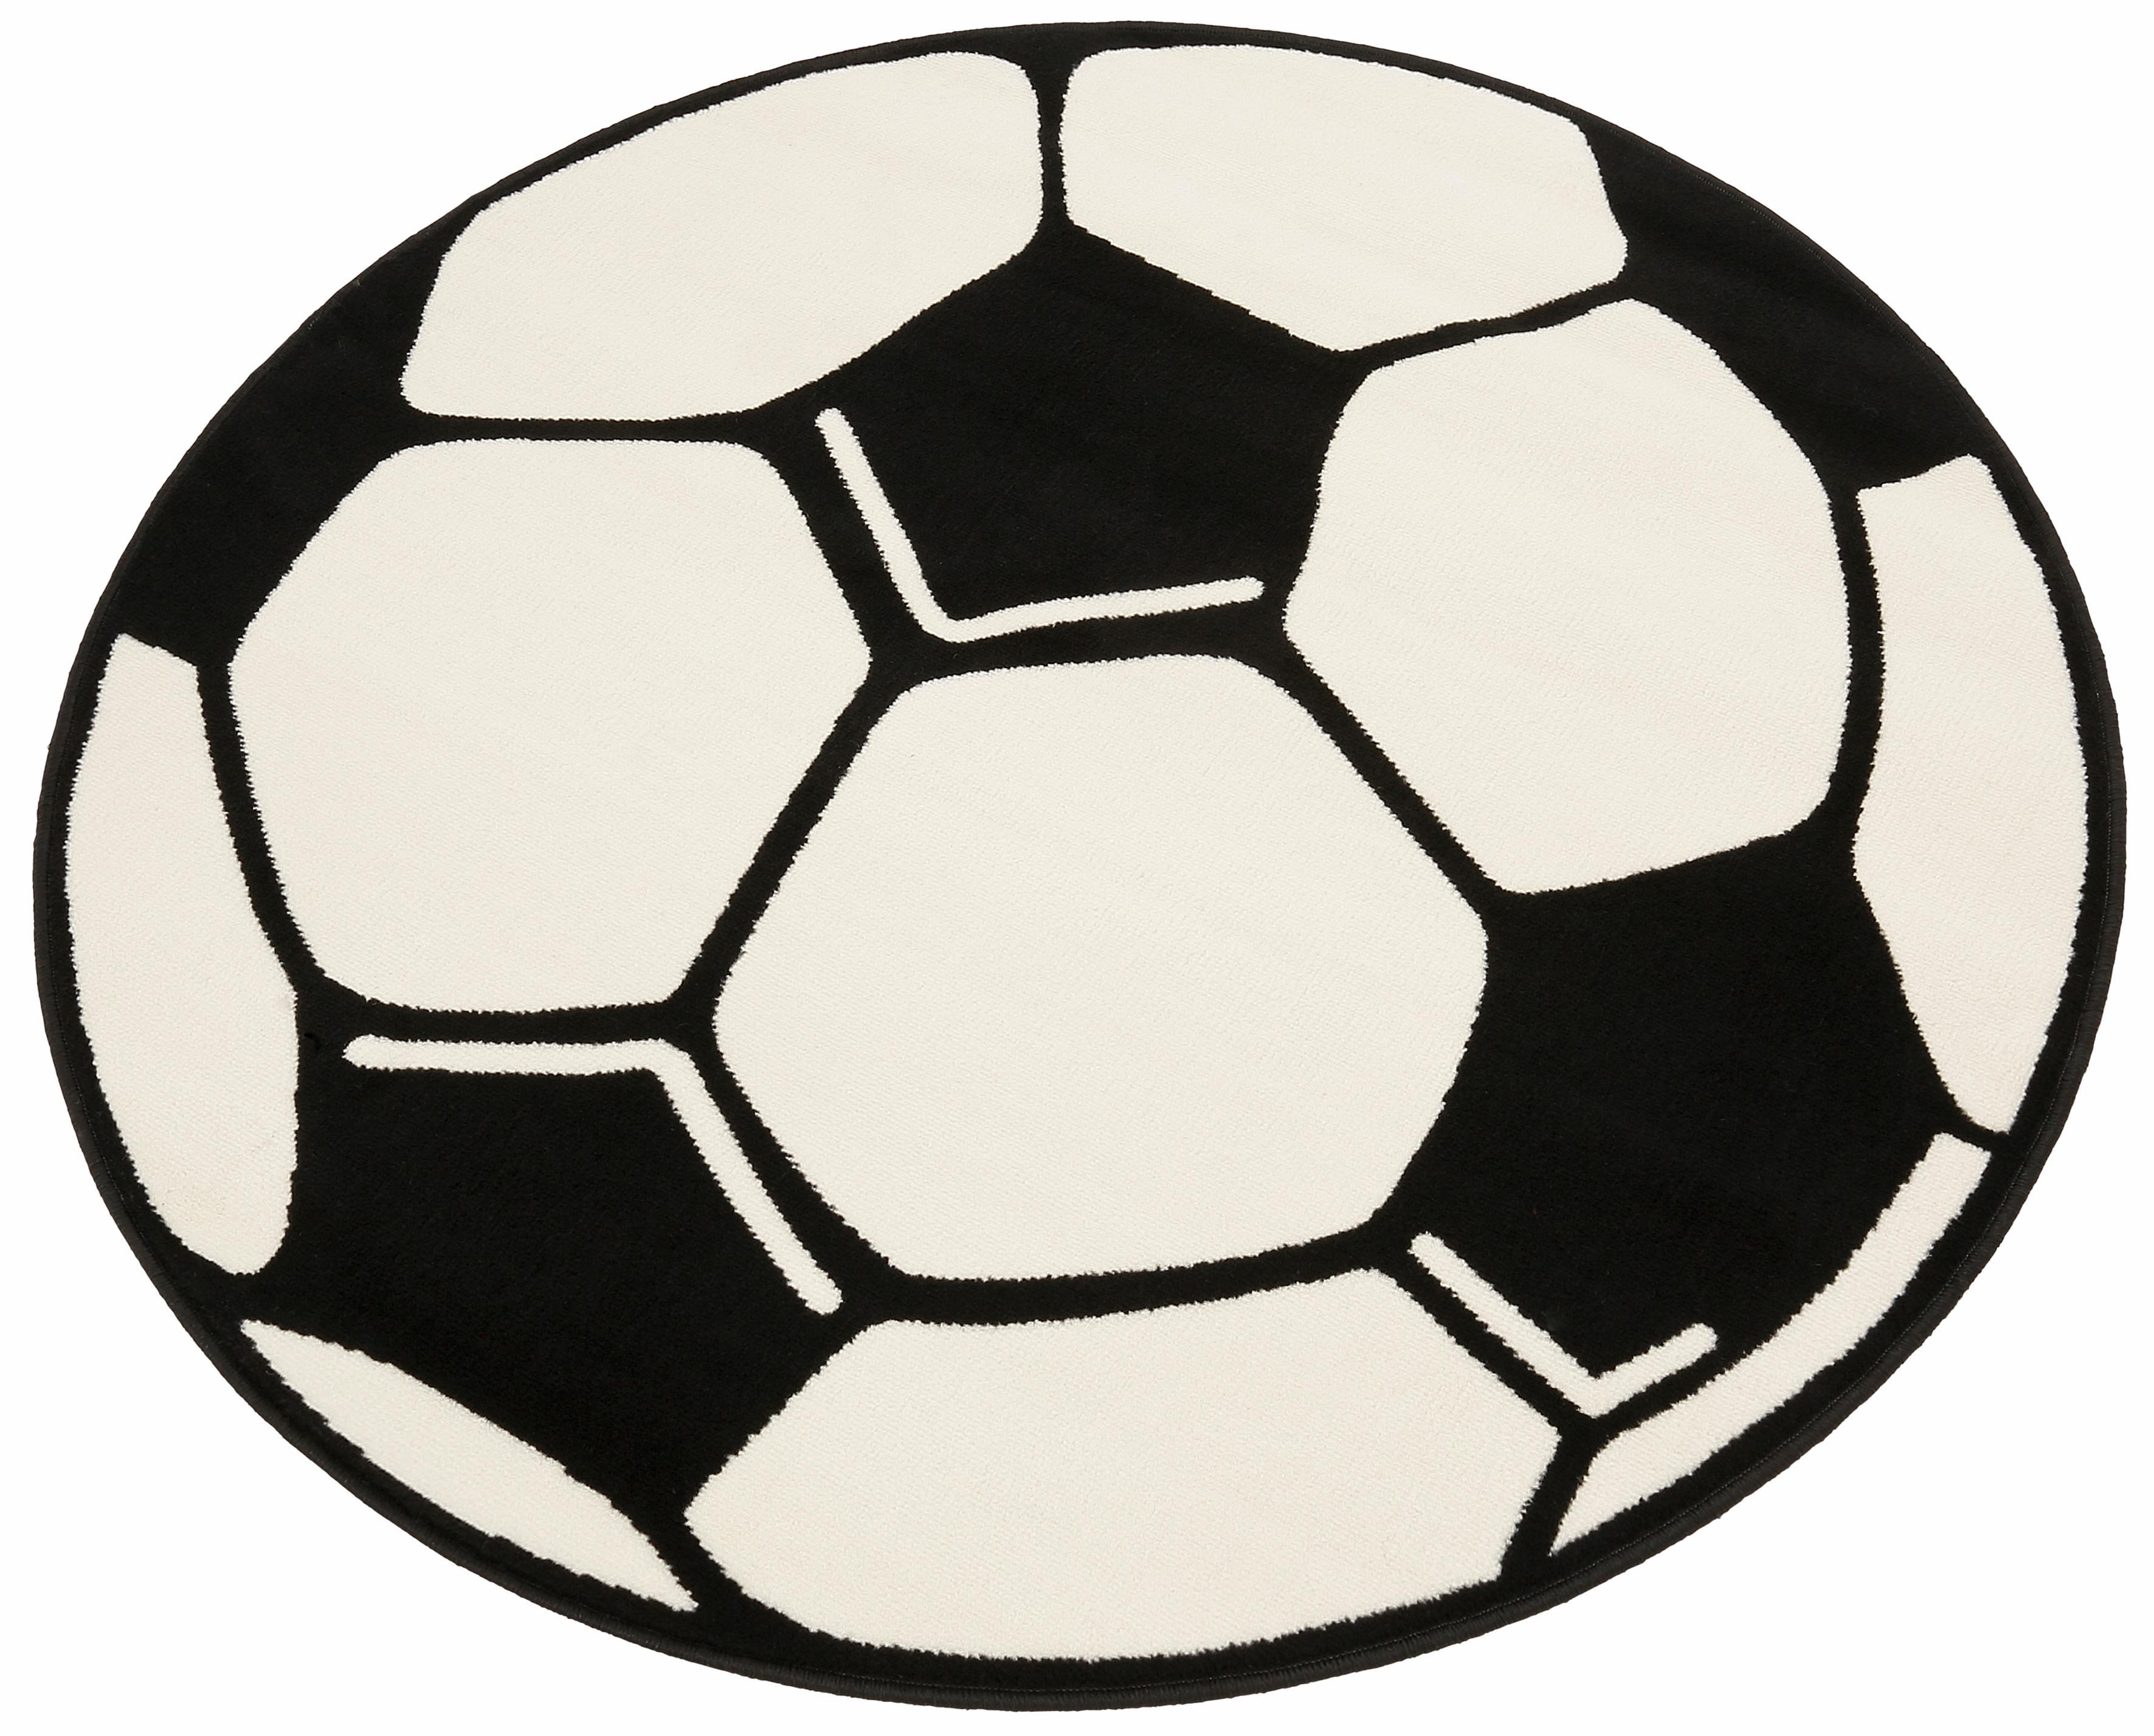 ecorepublic home geweven kinder vloerkleed voetbal snel gevonden otto. Black Bedroom Furniture Sets. Home Design Ideas